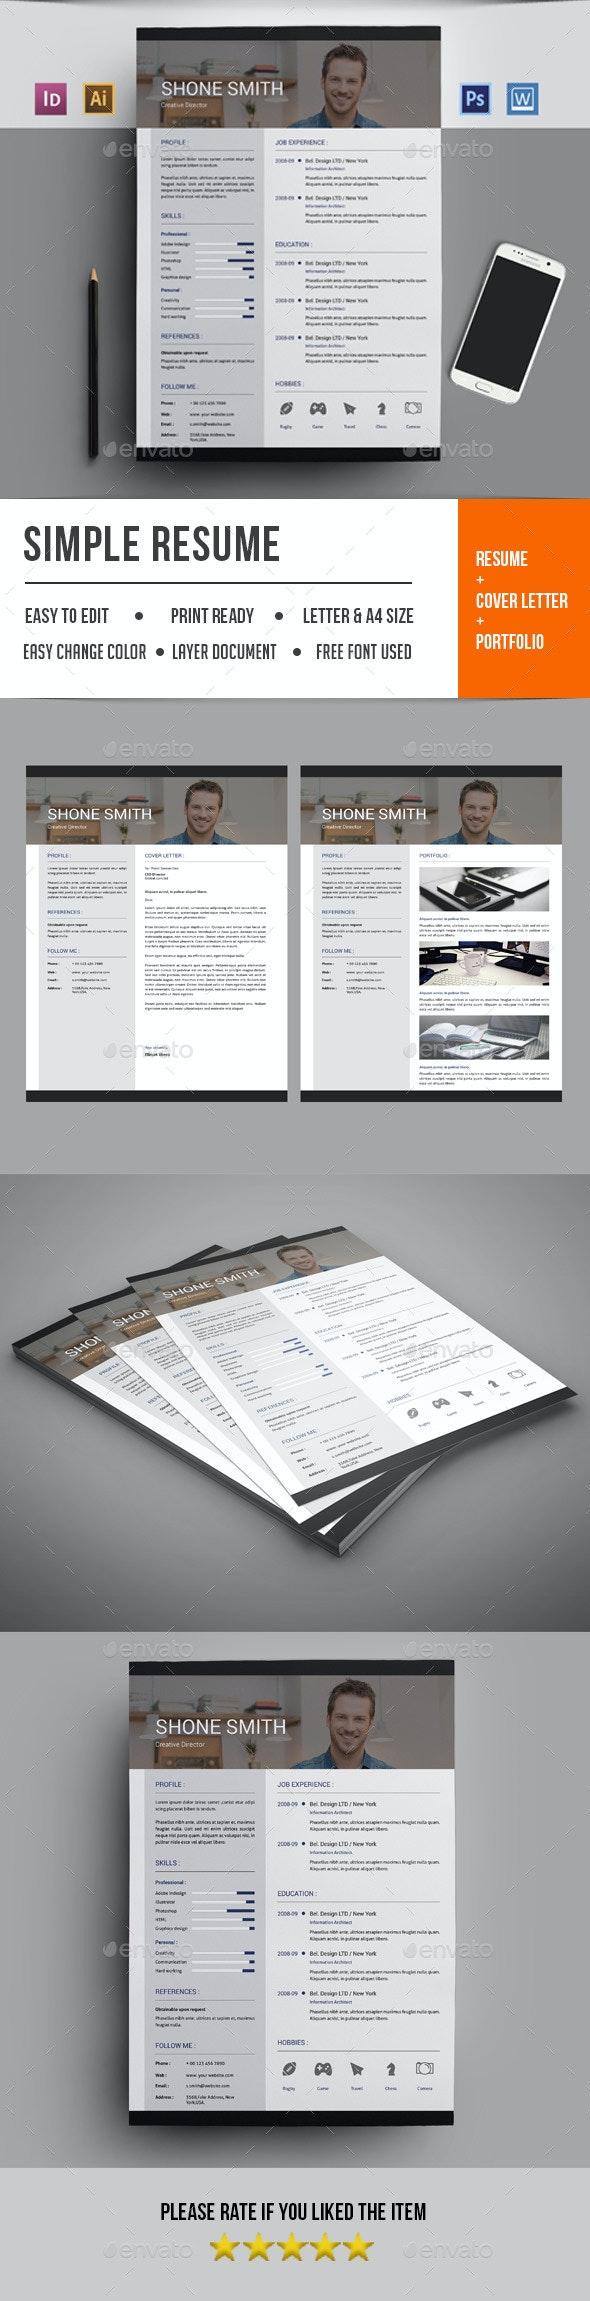 Resume Template-V18 - Resumes Stationery